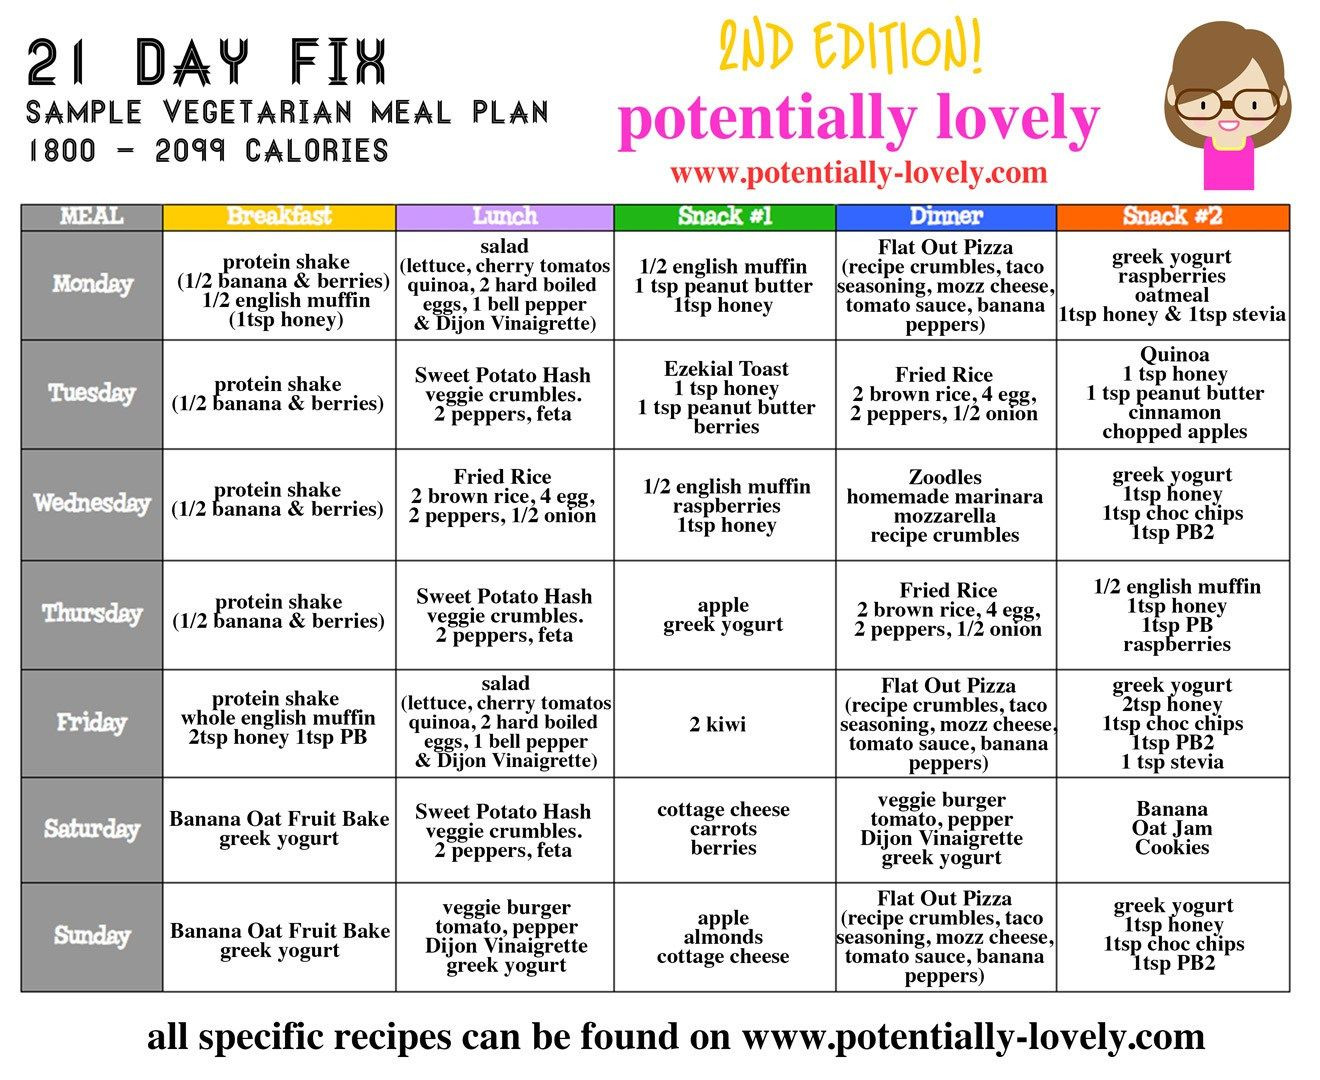 Vegan Diet Plan Weightloss 21 Days  21 Day Fix Weekly Ve arian Meal Plan 2